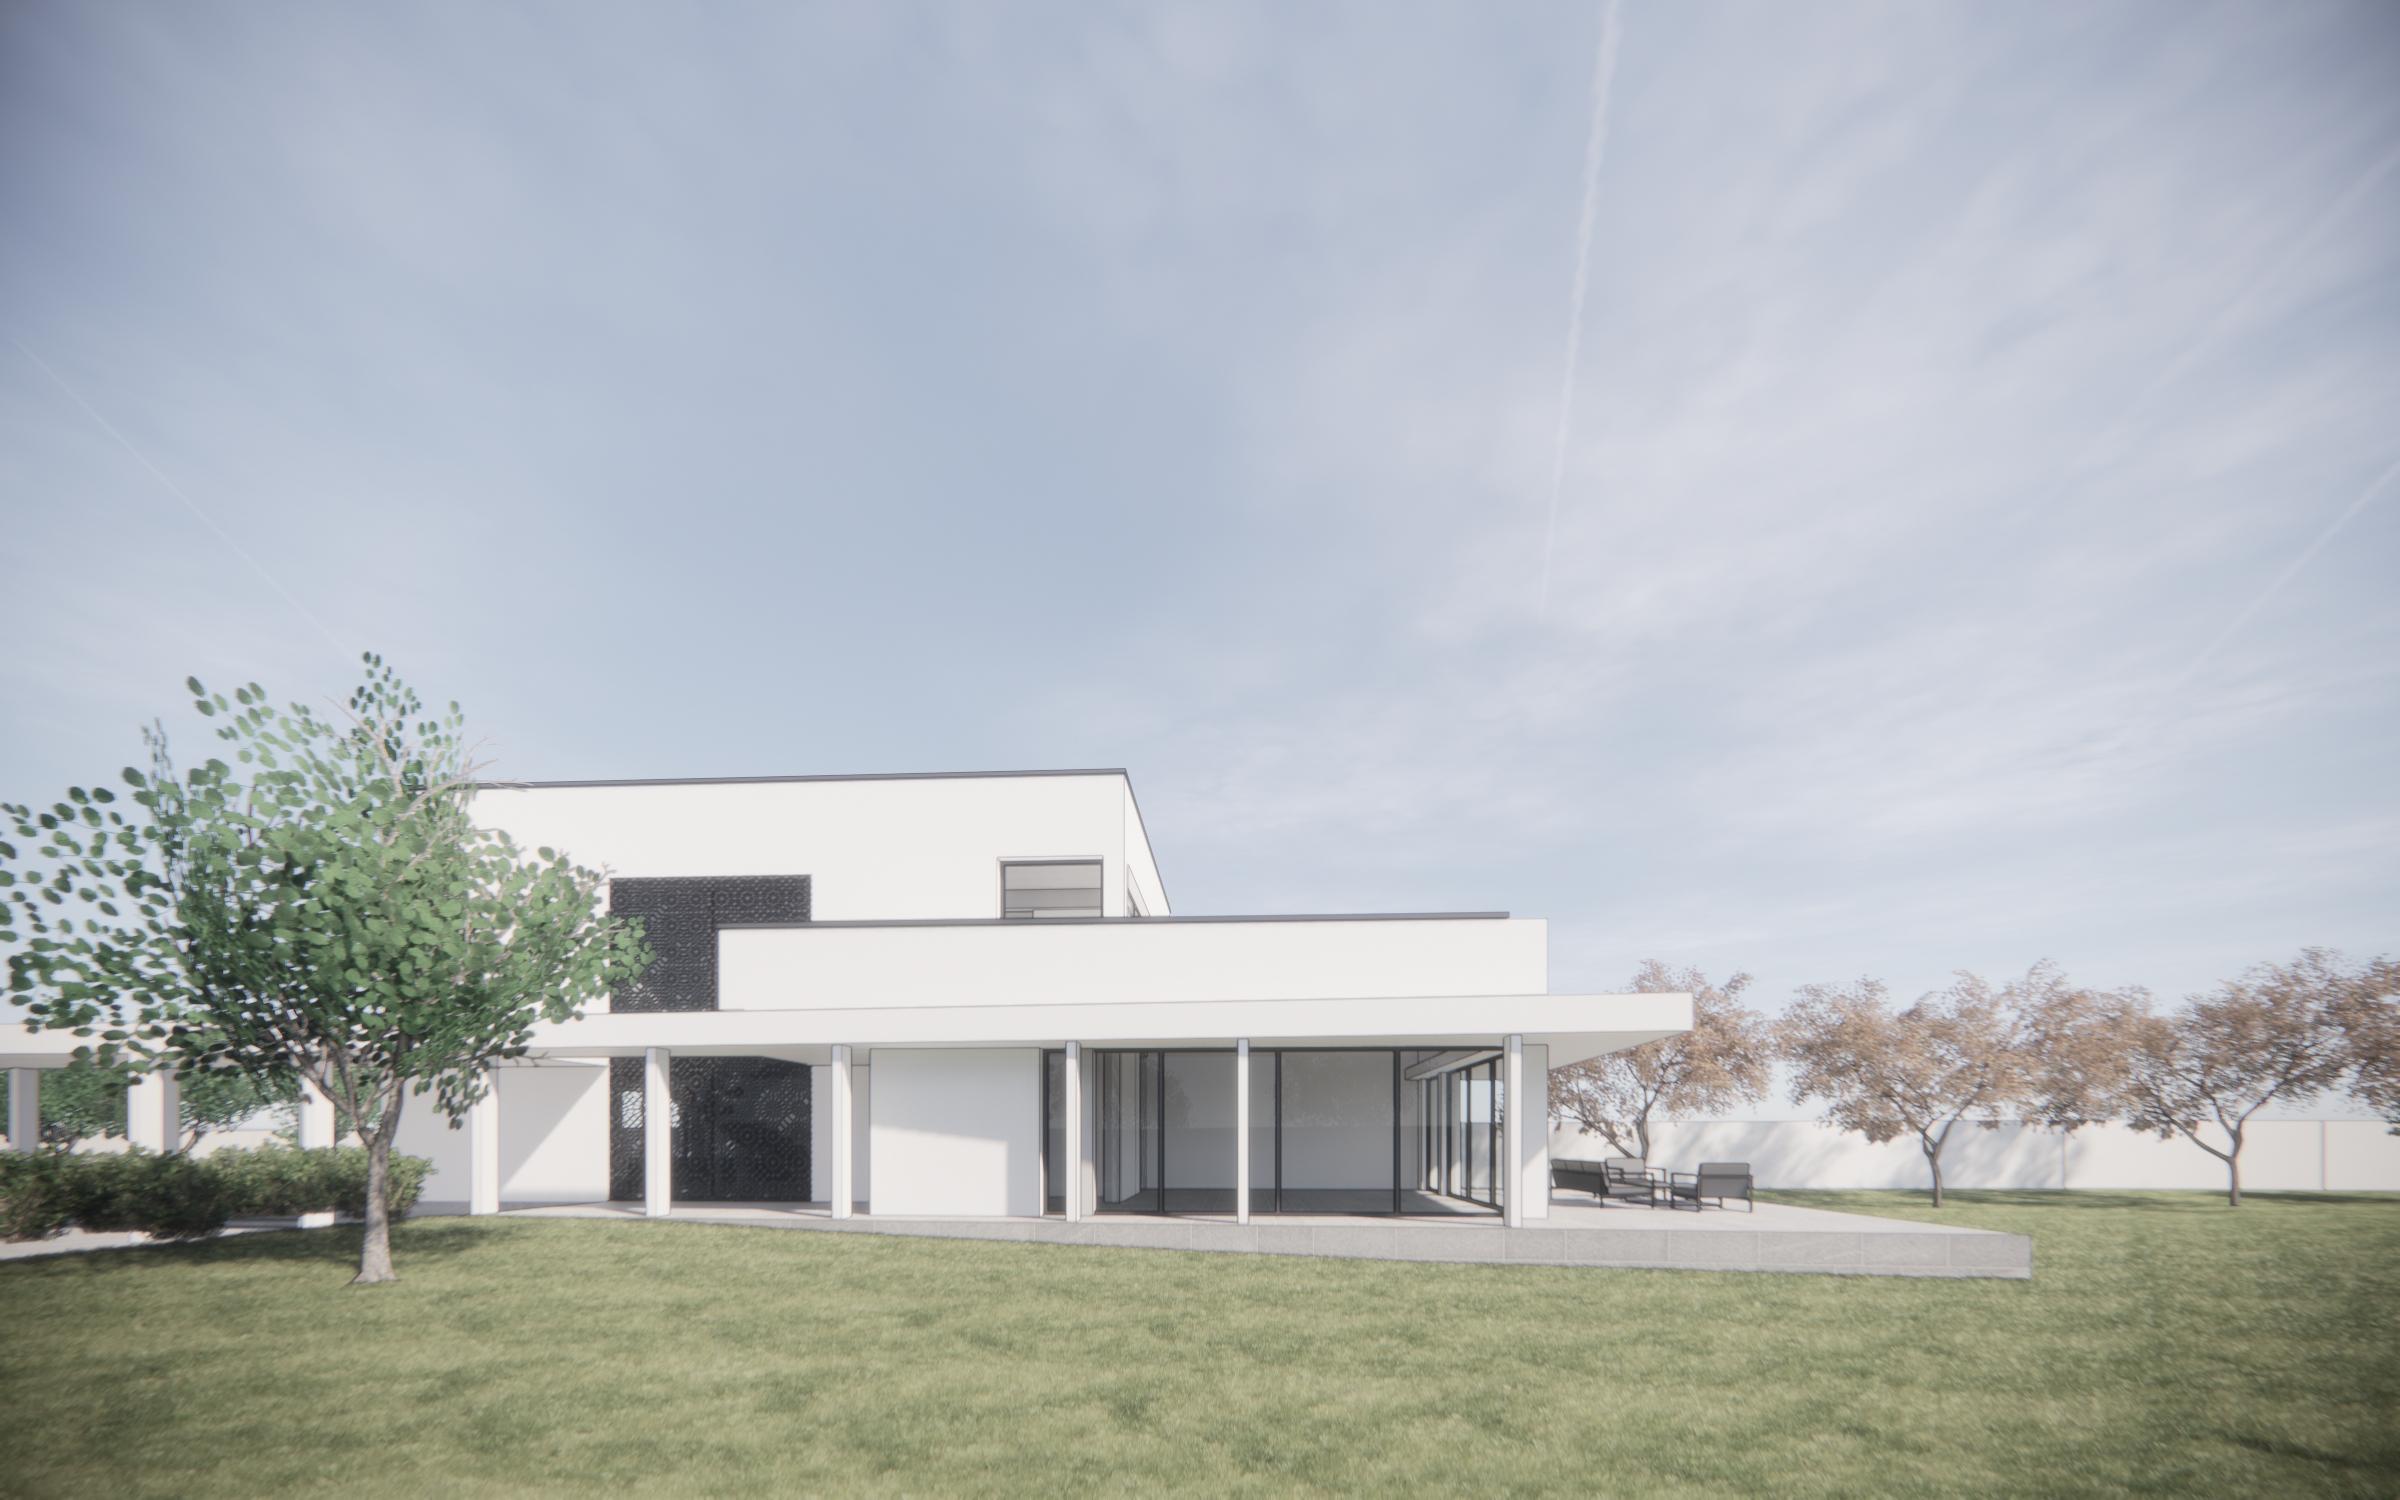 https://nbc-arhitect.ro/wp-content/uploads/2020/11/NBC-Arhitect-_-residential-_-2x-Snagov-_-Snagov-Romania_1.jpg